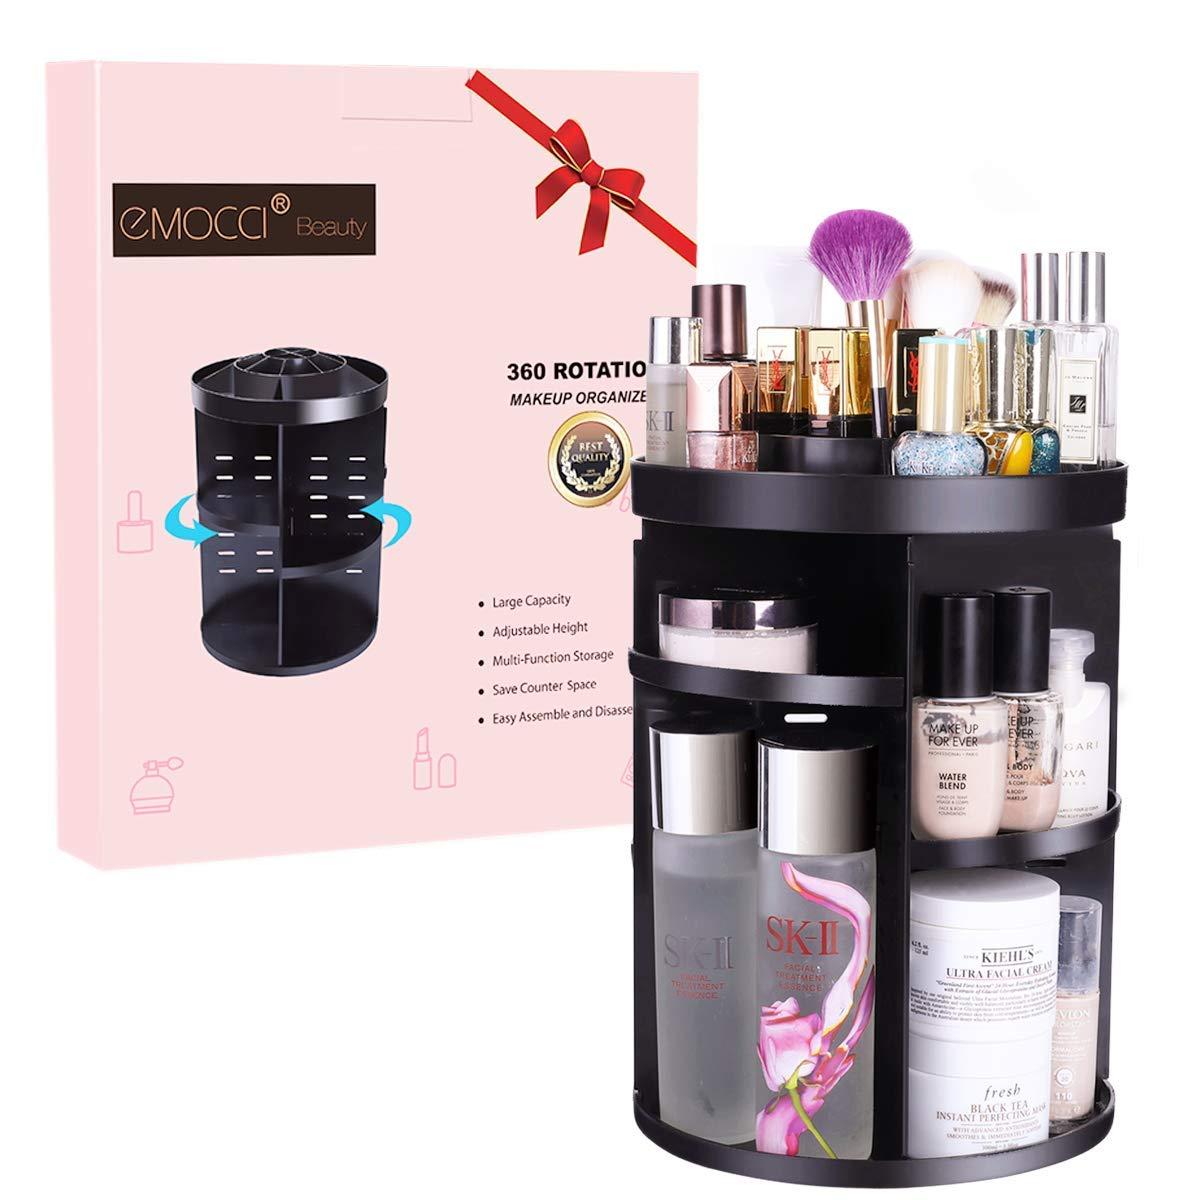 Premium Clear Acrylic Makeup Brush Desktop Storage Organizer, 5 Compartments Acrylic Cosmetic Organizer,1pc Pack